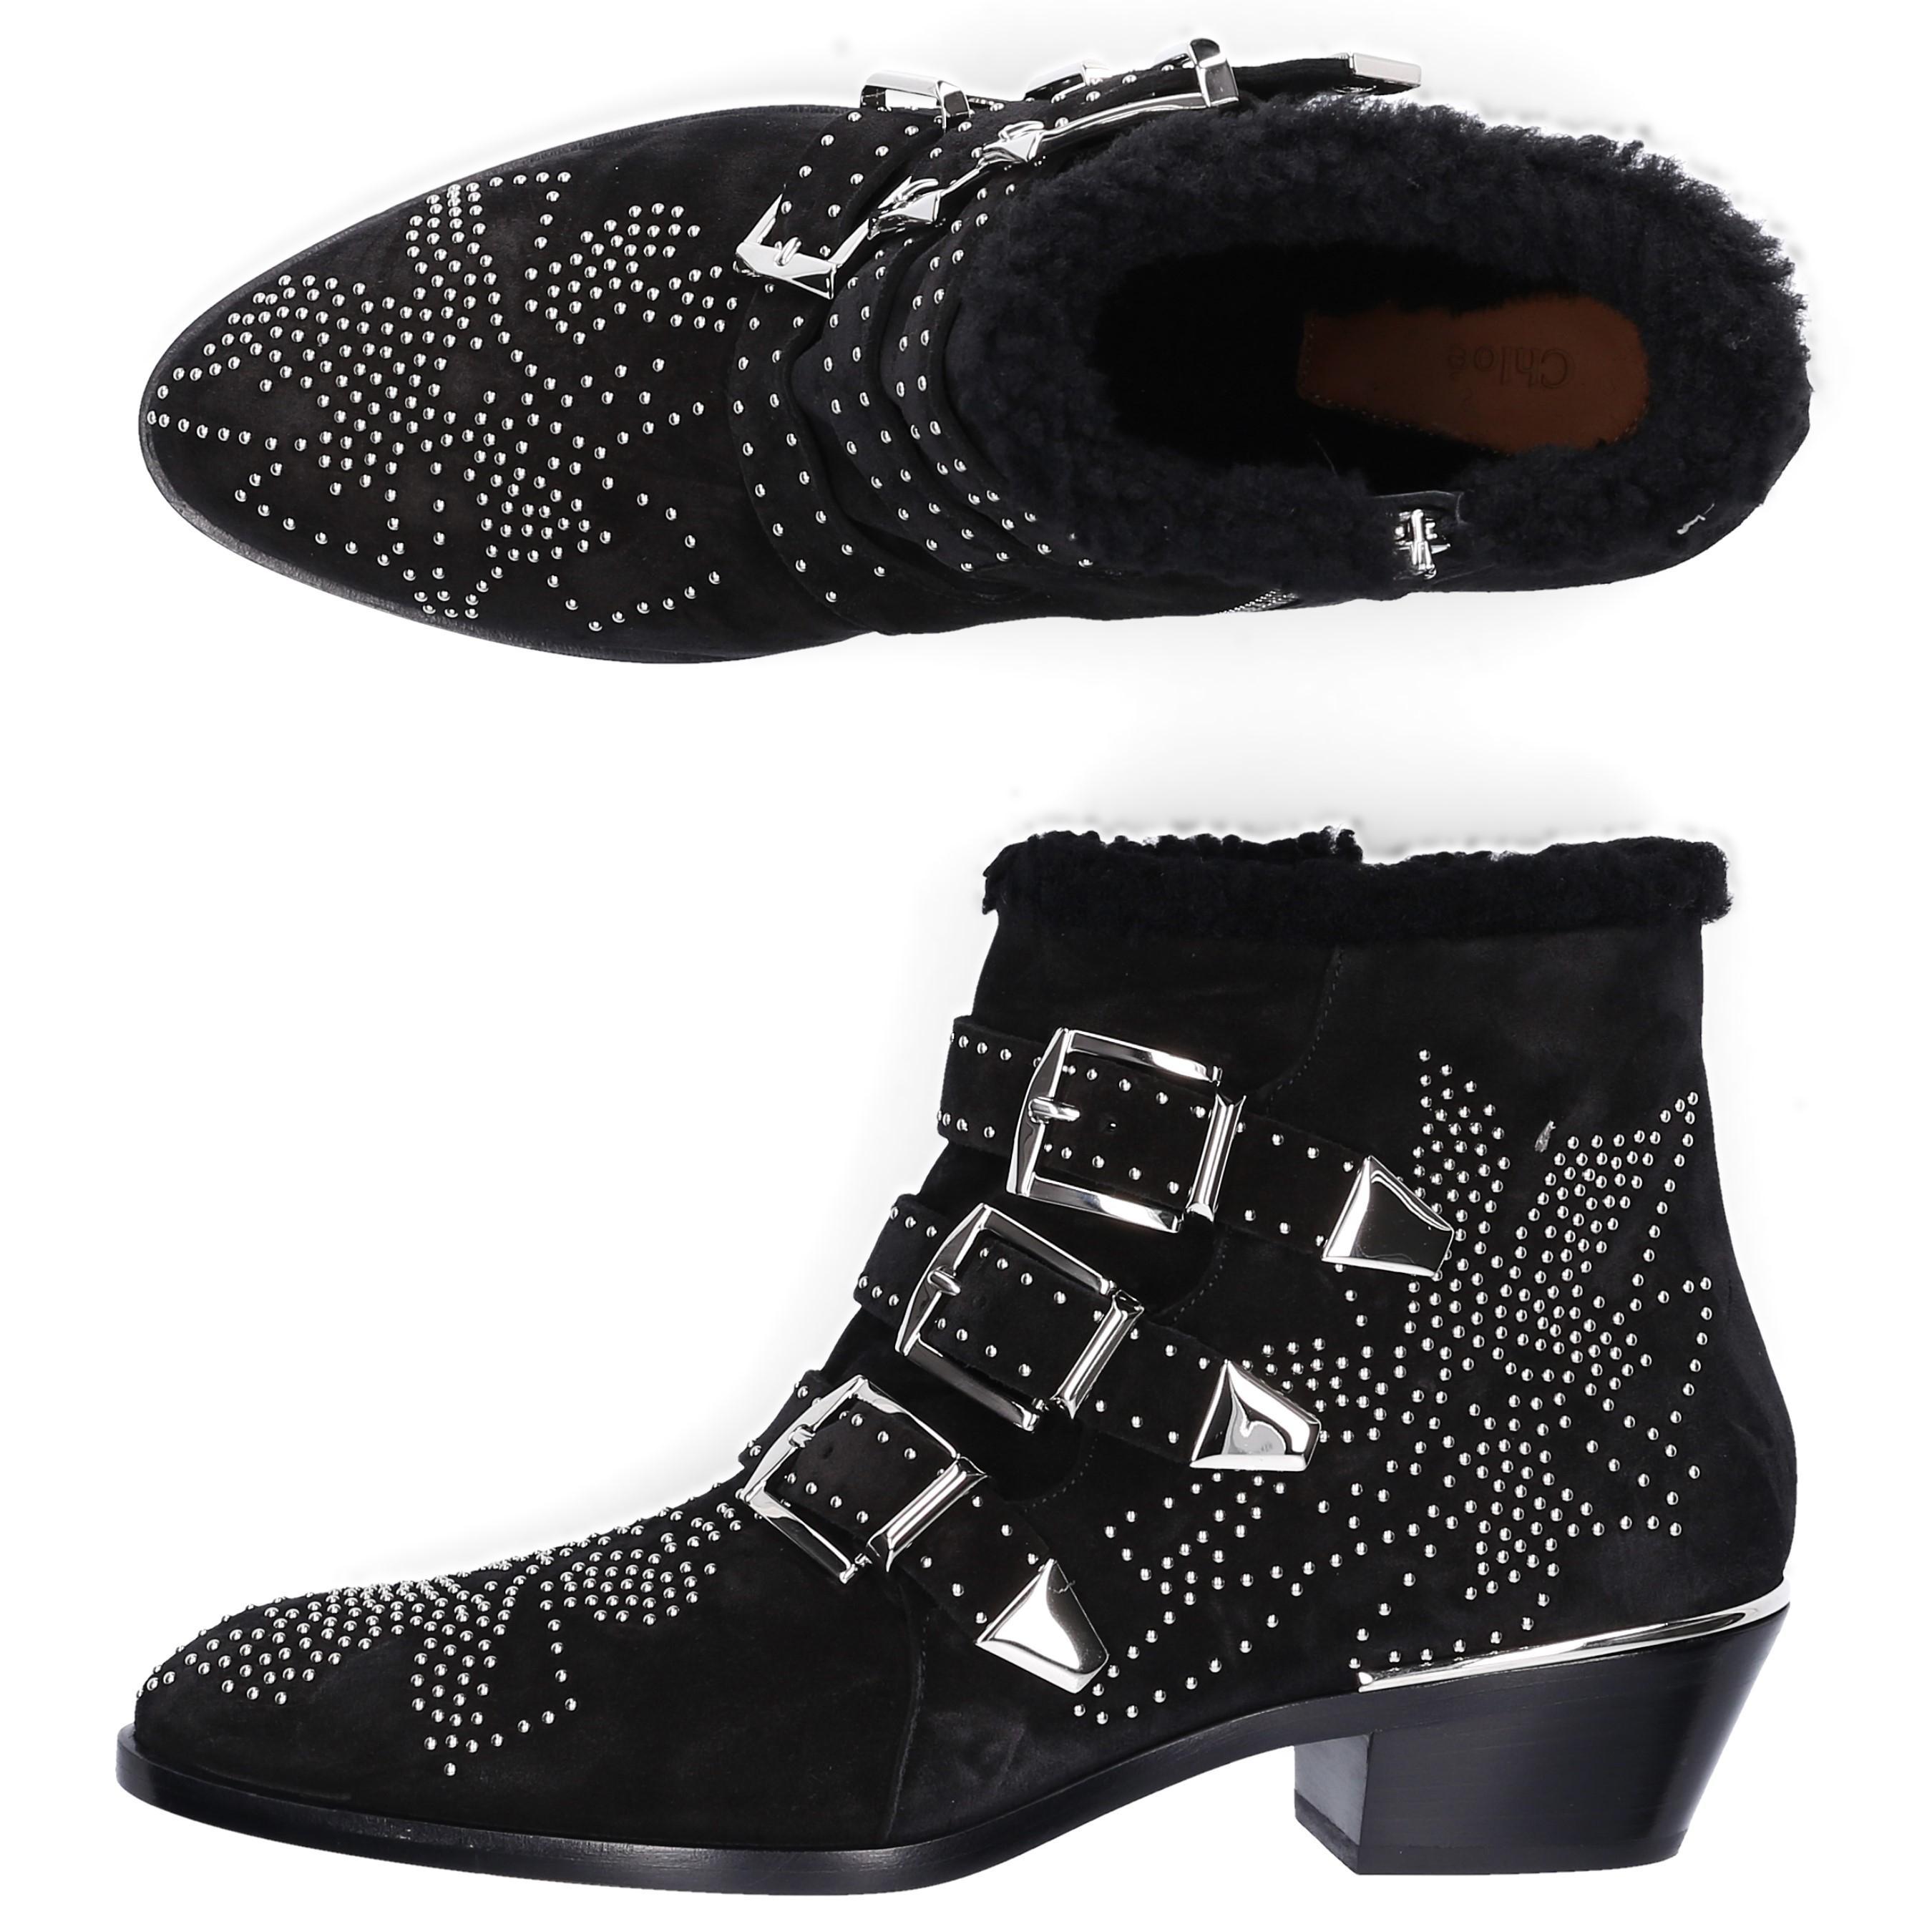 d0e2ac9fdb8 Chloé - Black Susanna Ankle Boots - Lyst. View fullscreen